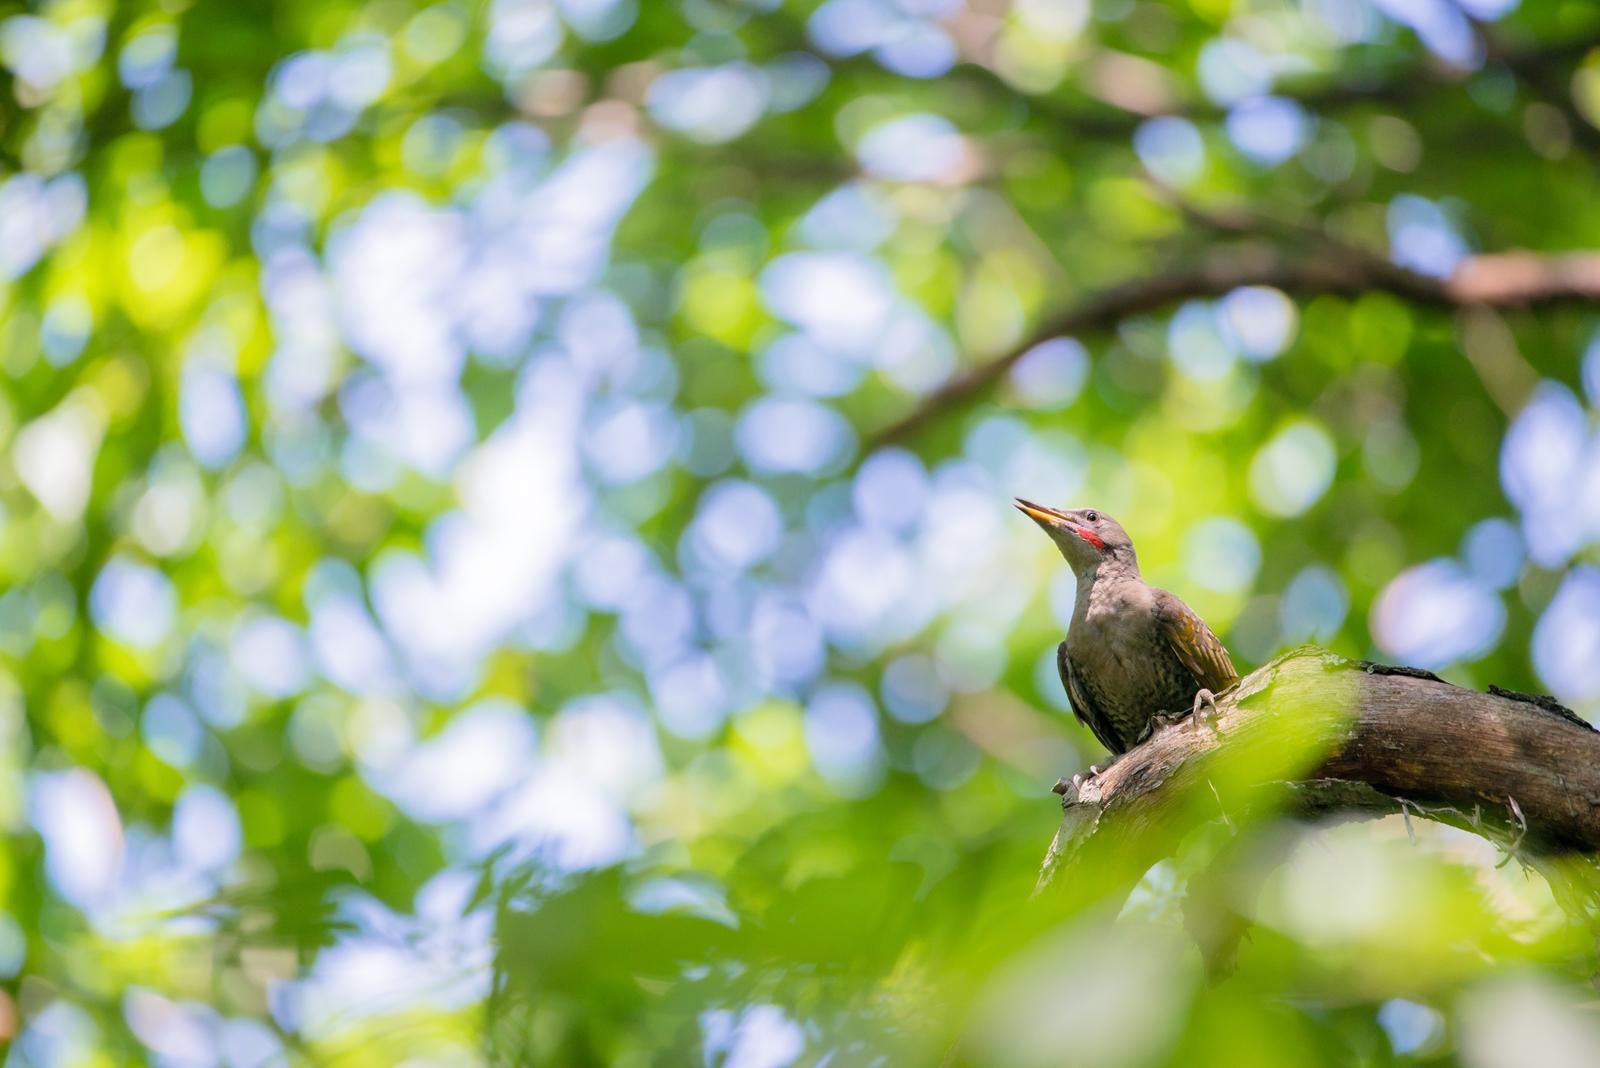 Photo: 緑のシャワー Green shower.  命に満ちる鮮やかな緑 陽射しを浴びて 輝き、力強く 緑の光で森を満たしていく  Japanese Green Woodpecker. (アオゲラ)  #birdphotography #birds #cooljapan #kawaii #nikon #sigma  Nikon D800E SIGMA 150-600mm F5-6.3 DG OS HSM Contemporary